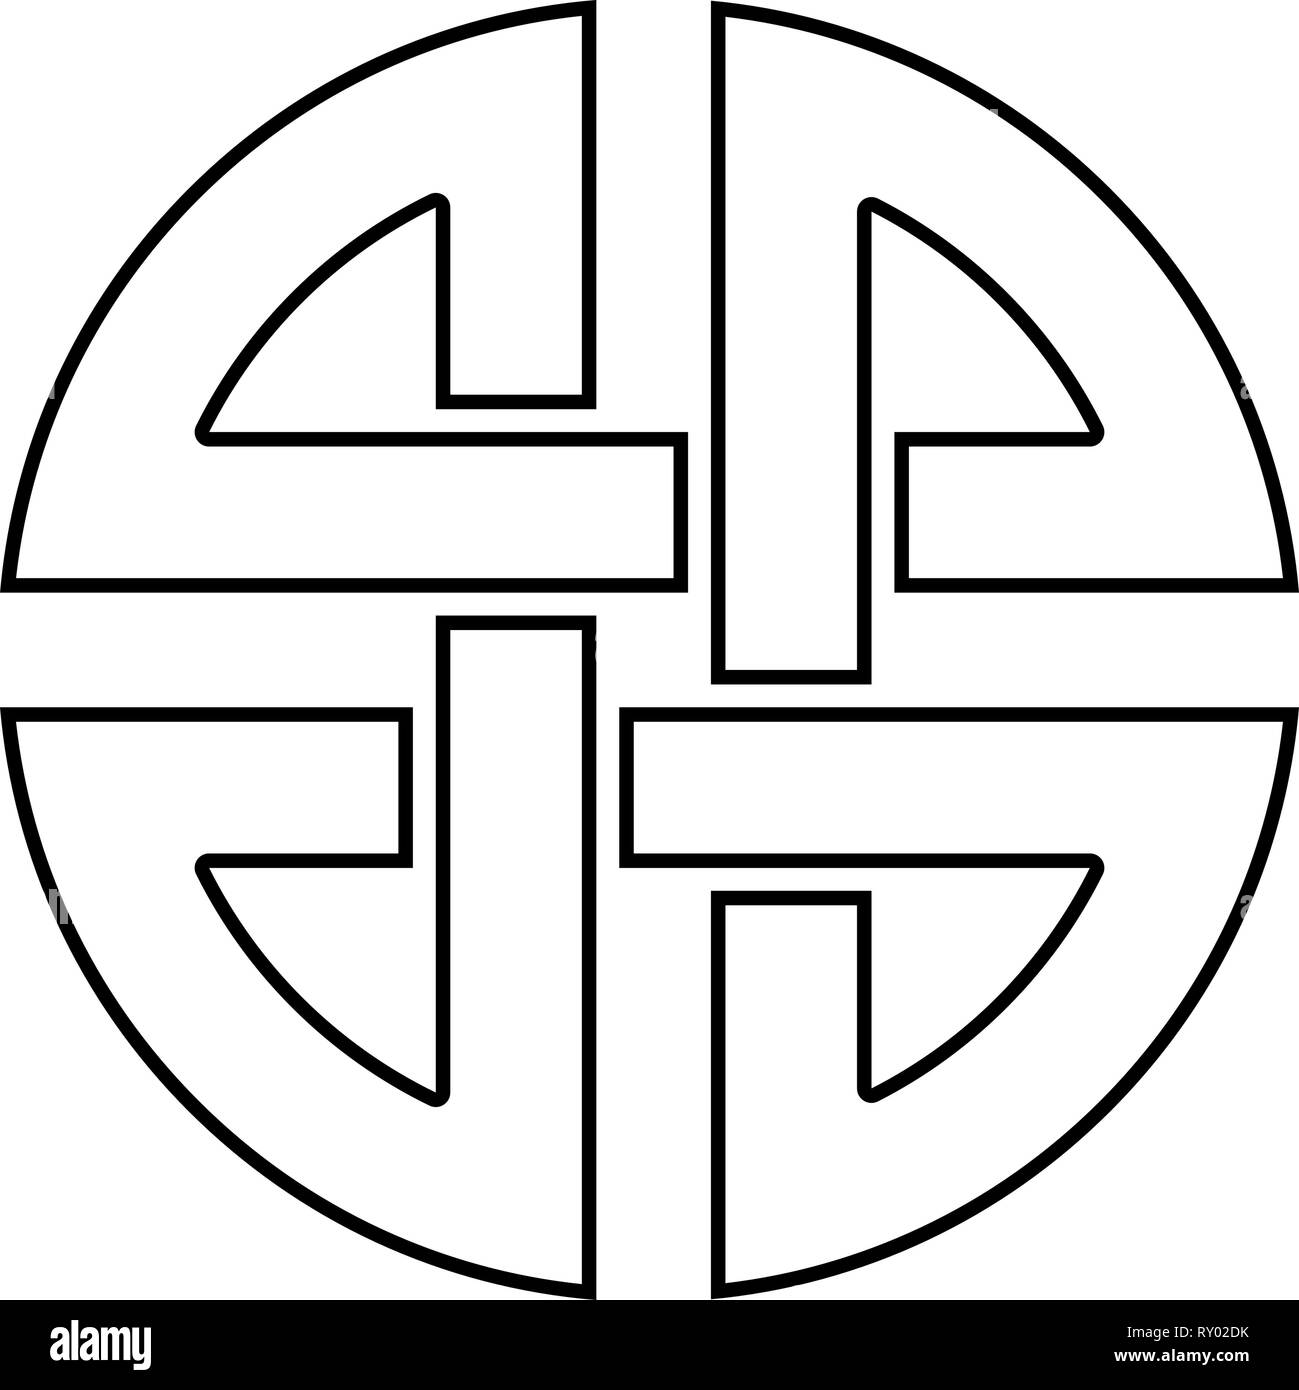 Ancient Symbol Stock Photos & Ancient Symbol Stock Images